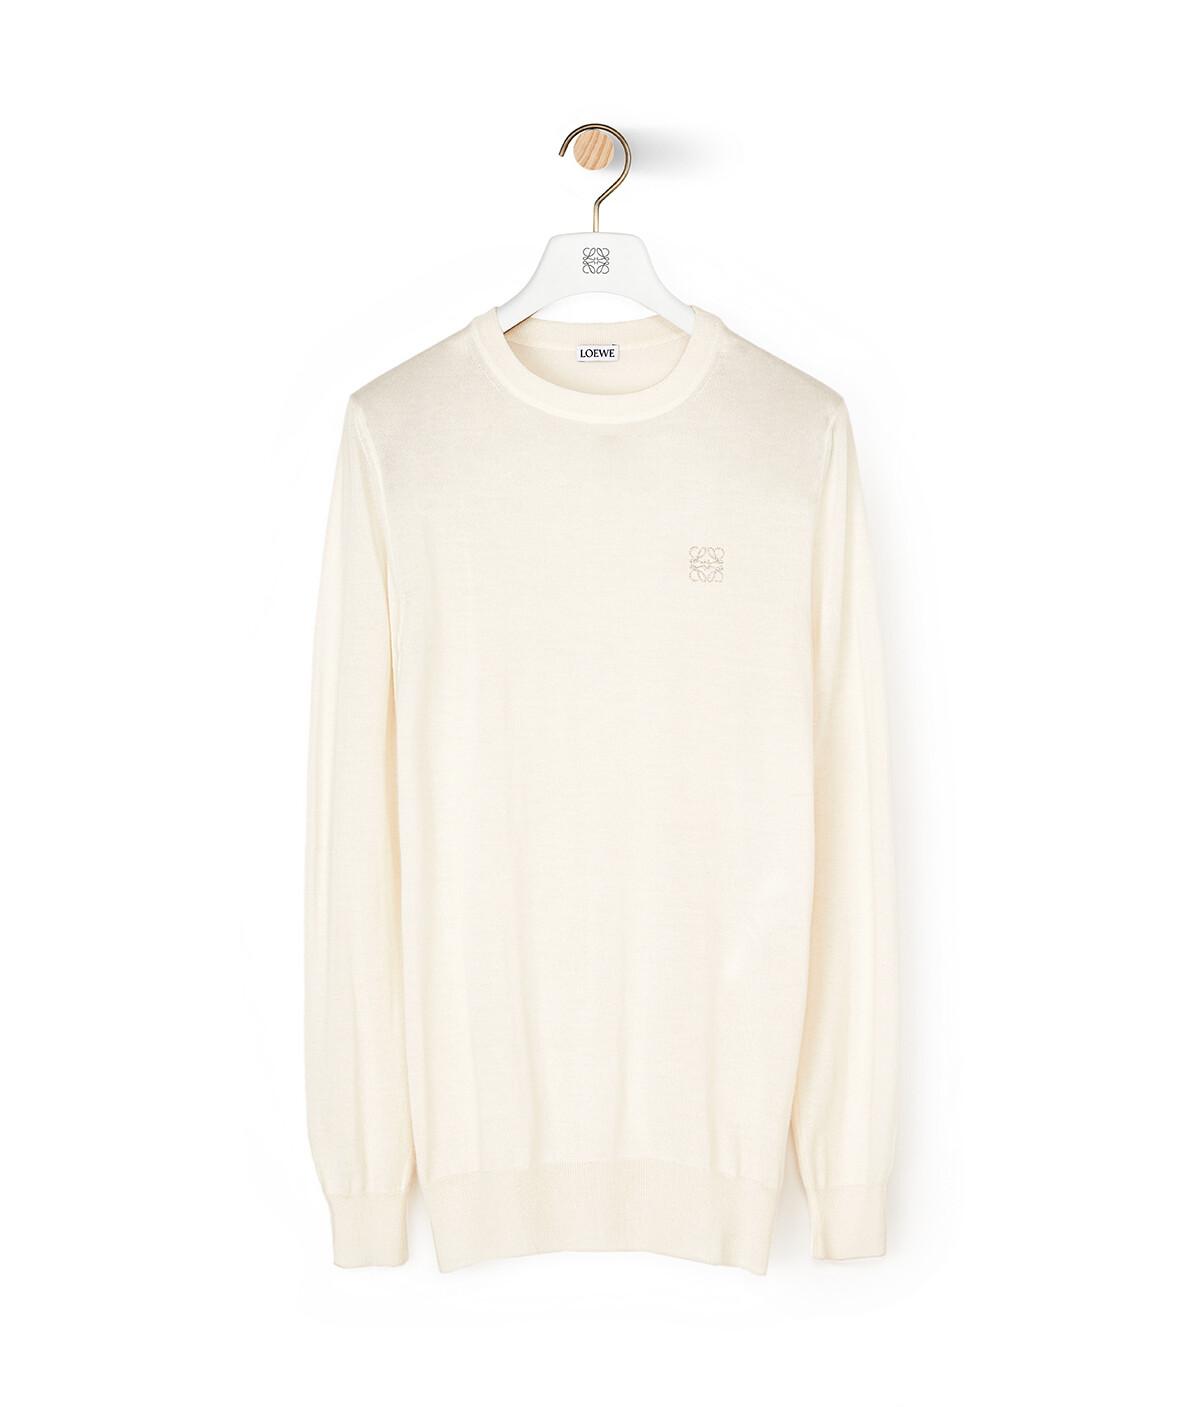 LOEWE Anagram Sweater Ecru front